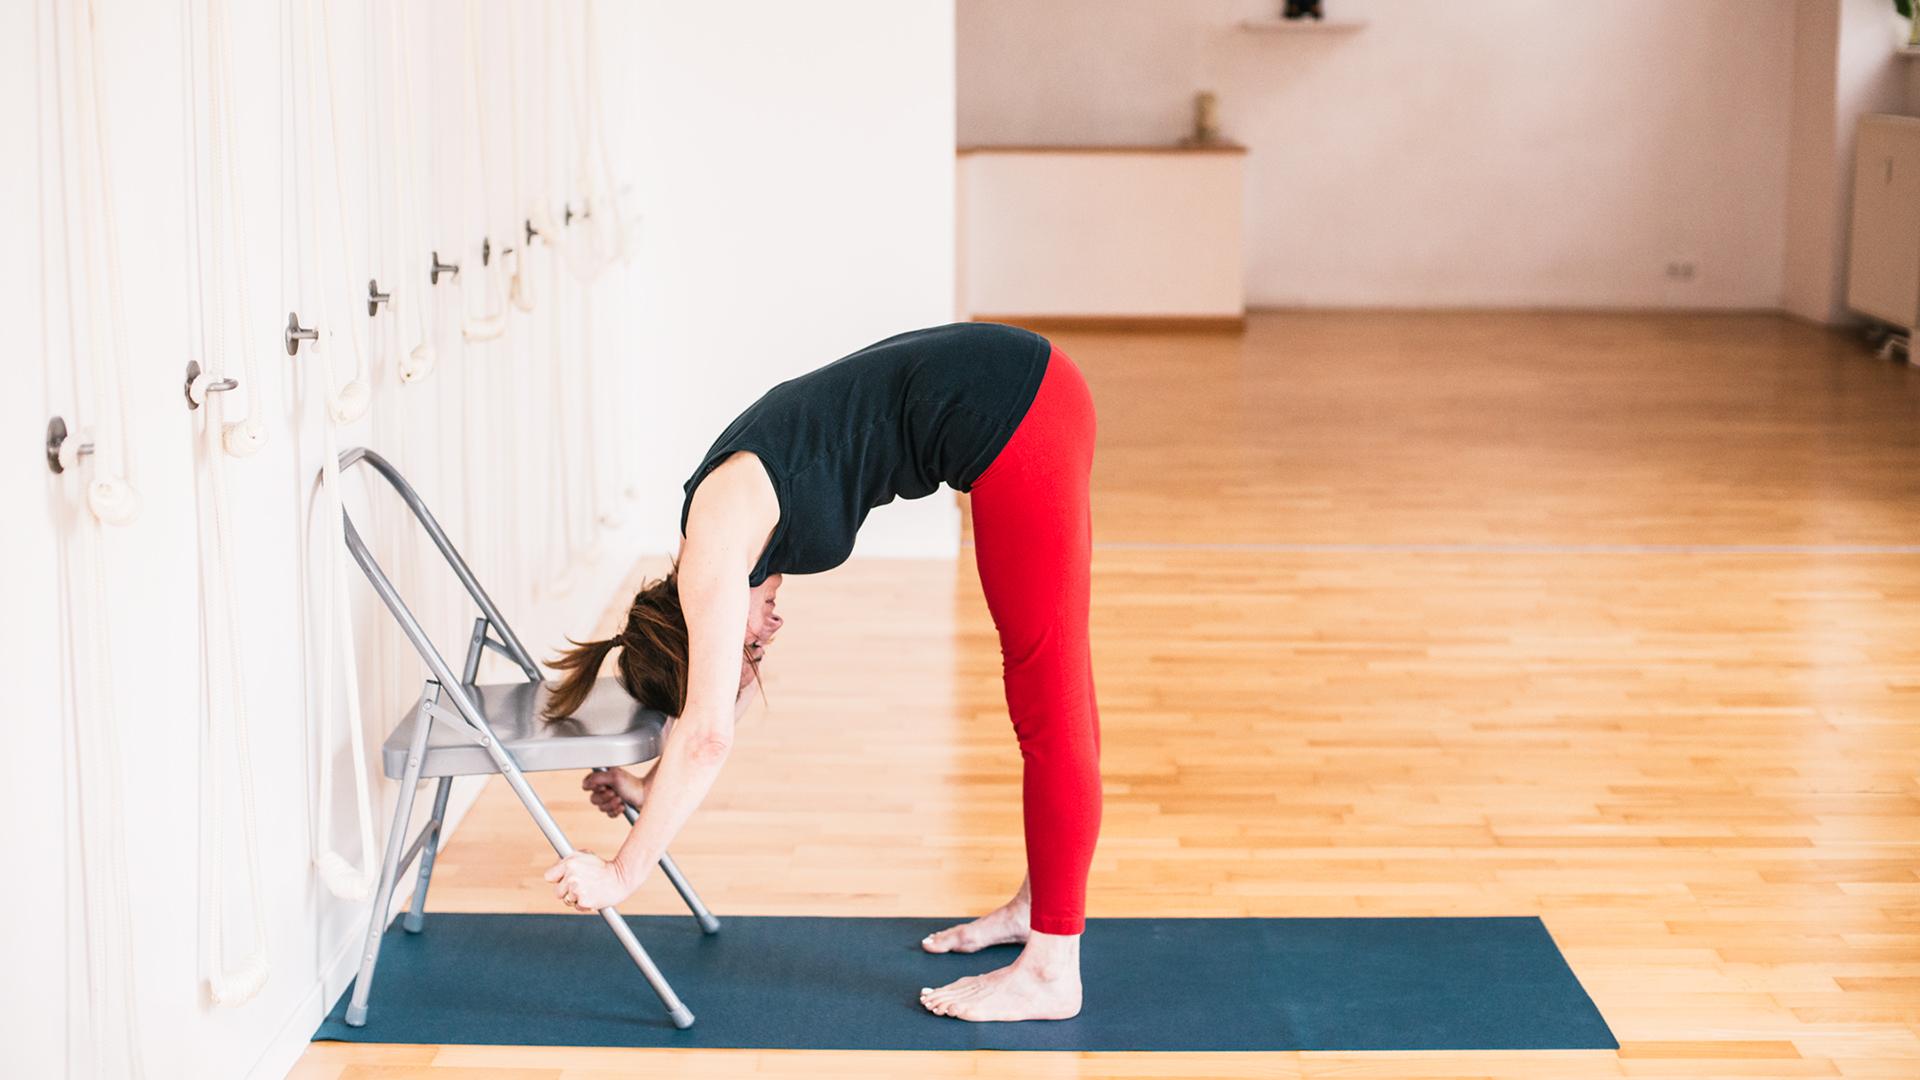 elizabeth-smullens-brass-standing-forward-bend-uttanasana-chair-full